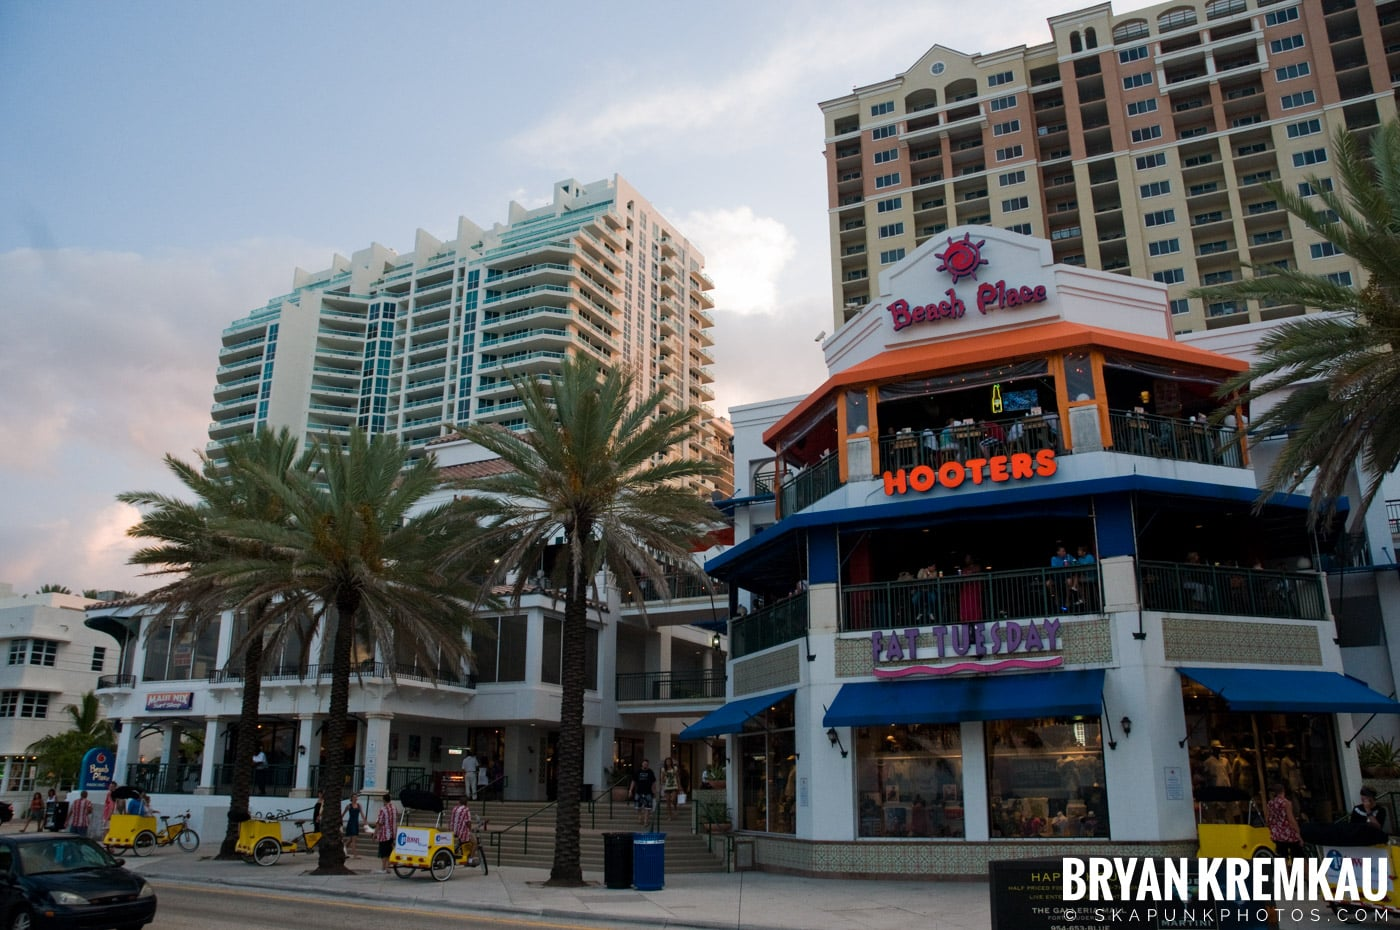 Florida Keys Vacation - 7.09.10 - 7.15.10 (94)